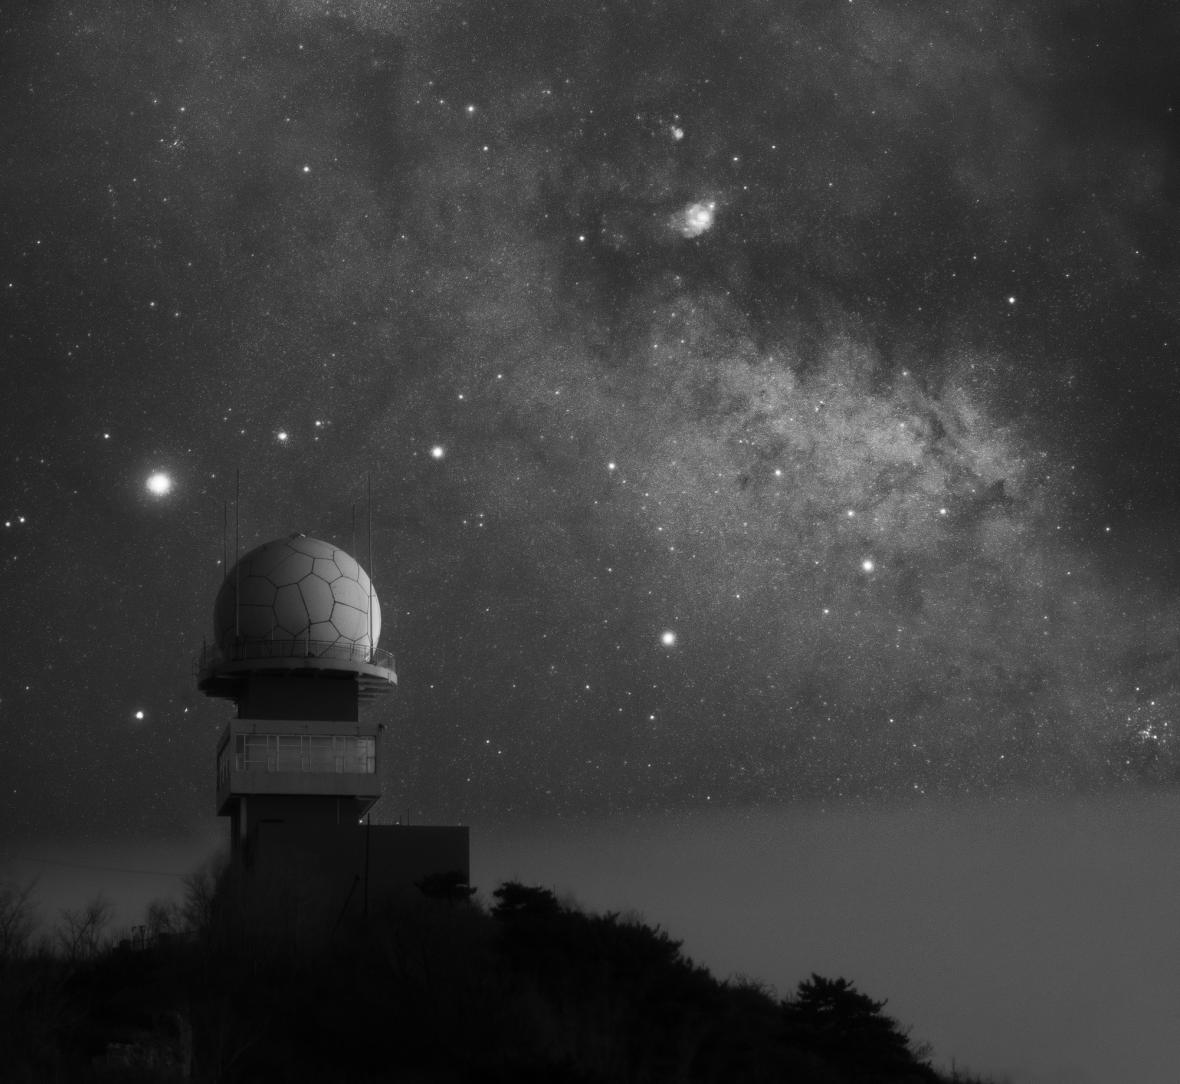 oice of the Universe © Weijian Chen